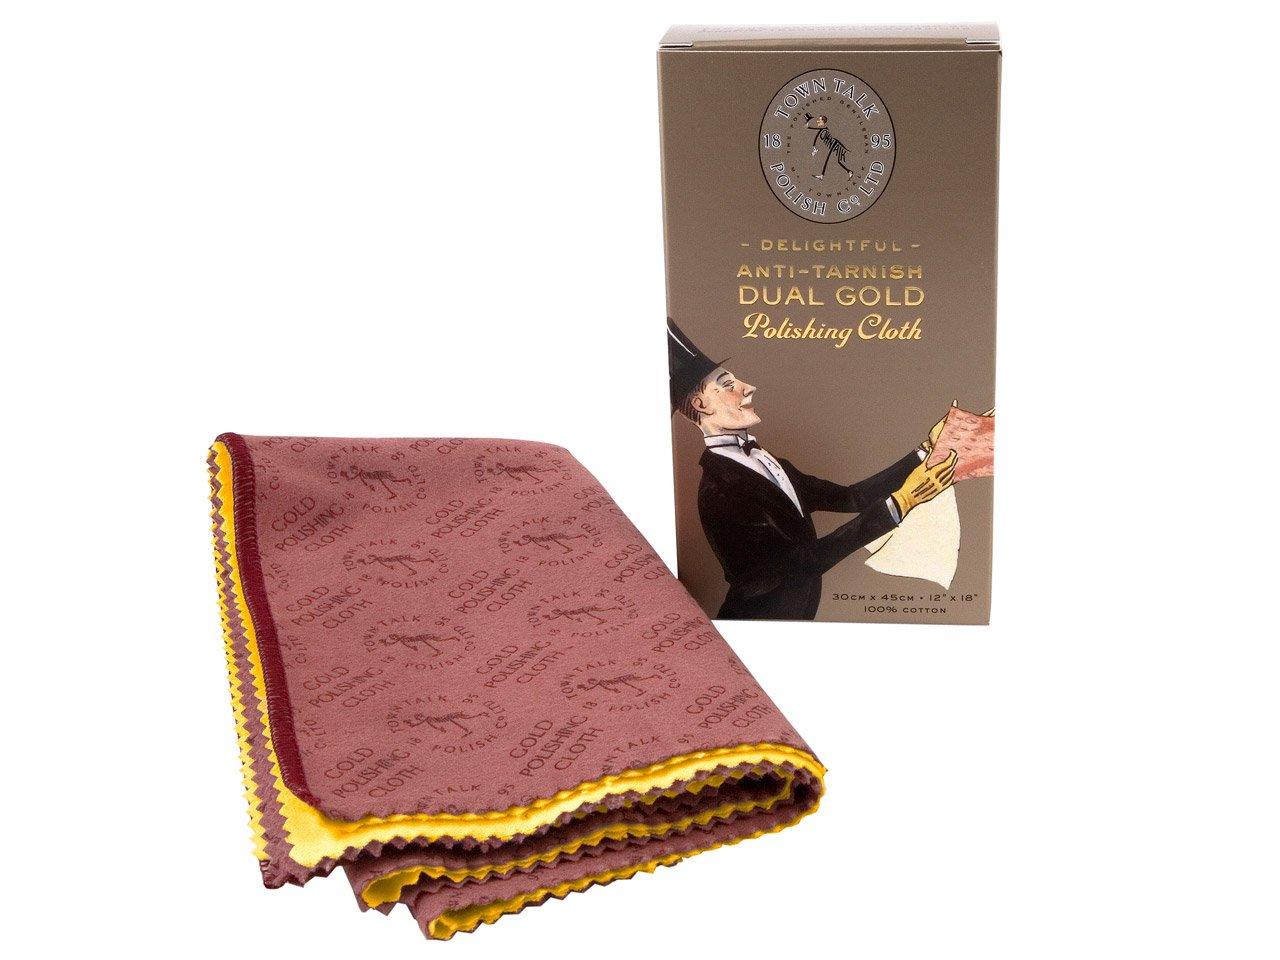 Town Talk Dual Gold Polishing Cloth 30 x 45 cm